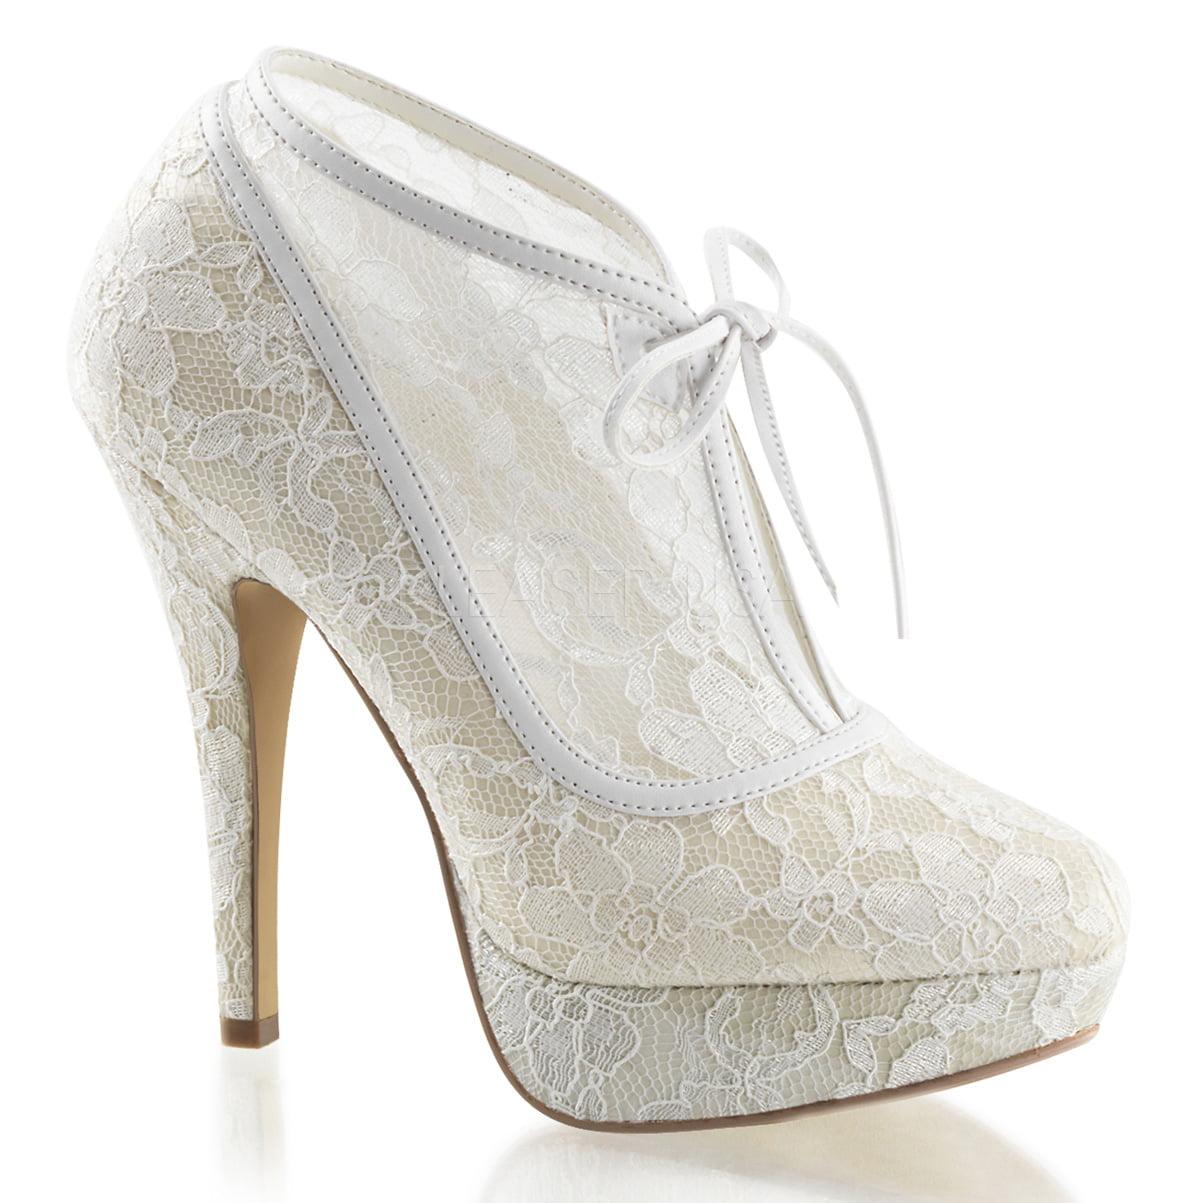 Women's Fabulicious Lolita 32 Economical, stylish, and eye-catching shoes